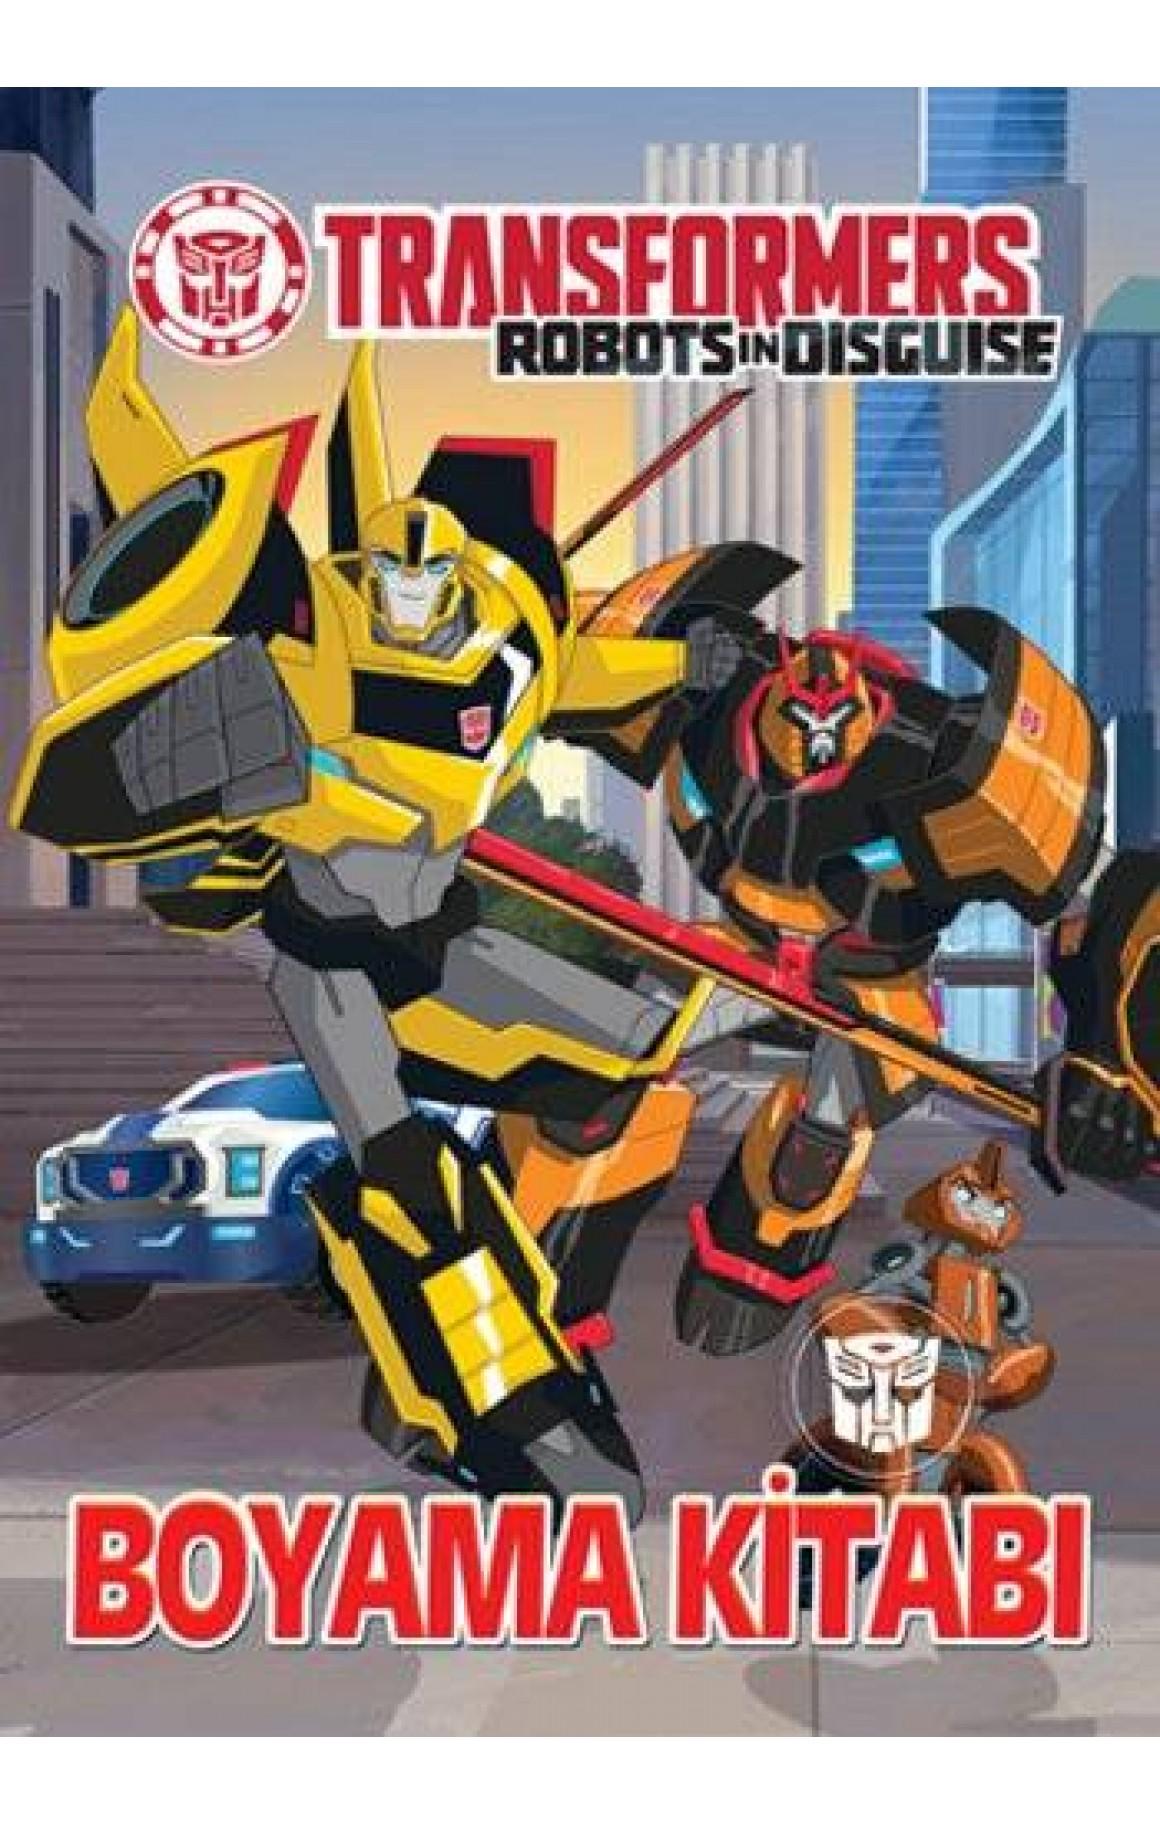 Transformers Boyama Kitabi